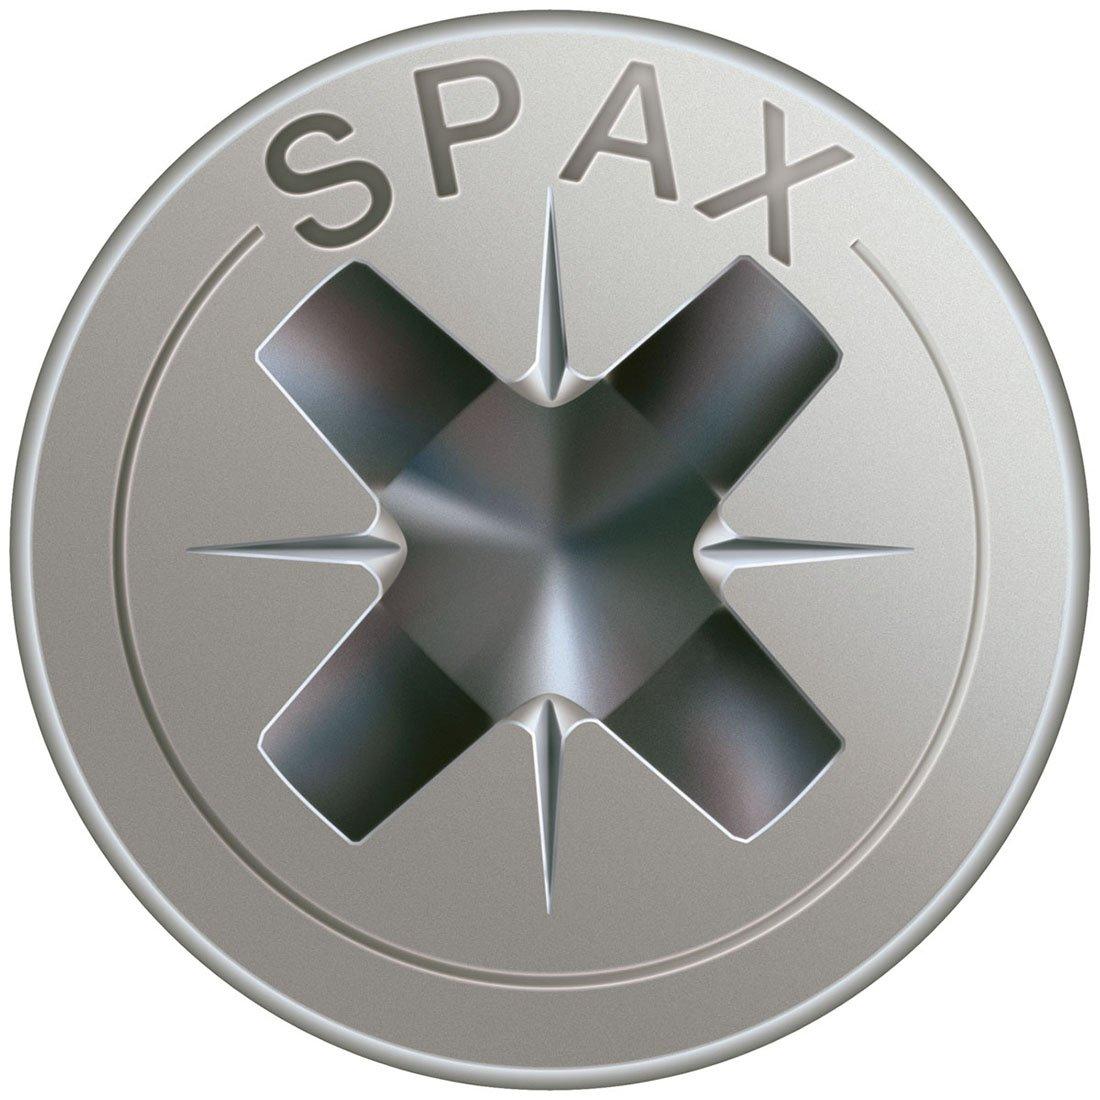 , Acero inoxidable s SPAX 1087000300123 12mm 200pieza Phillips - Tornillo Tornillo, Acero inoxidable, Madera, Cabeza plana, PH